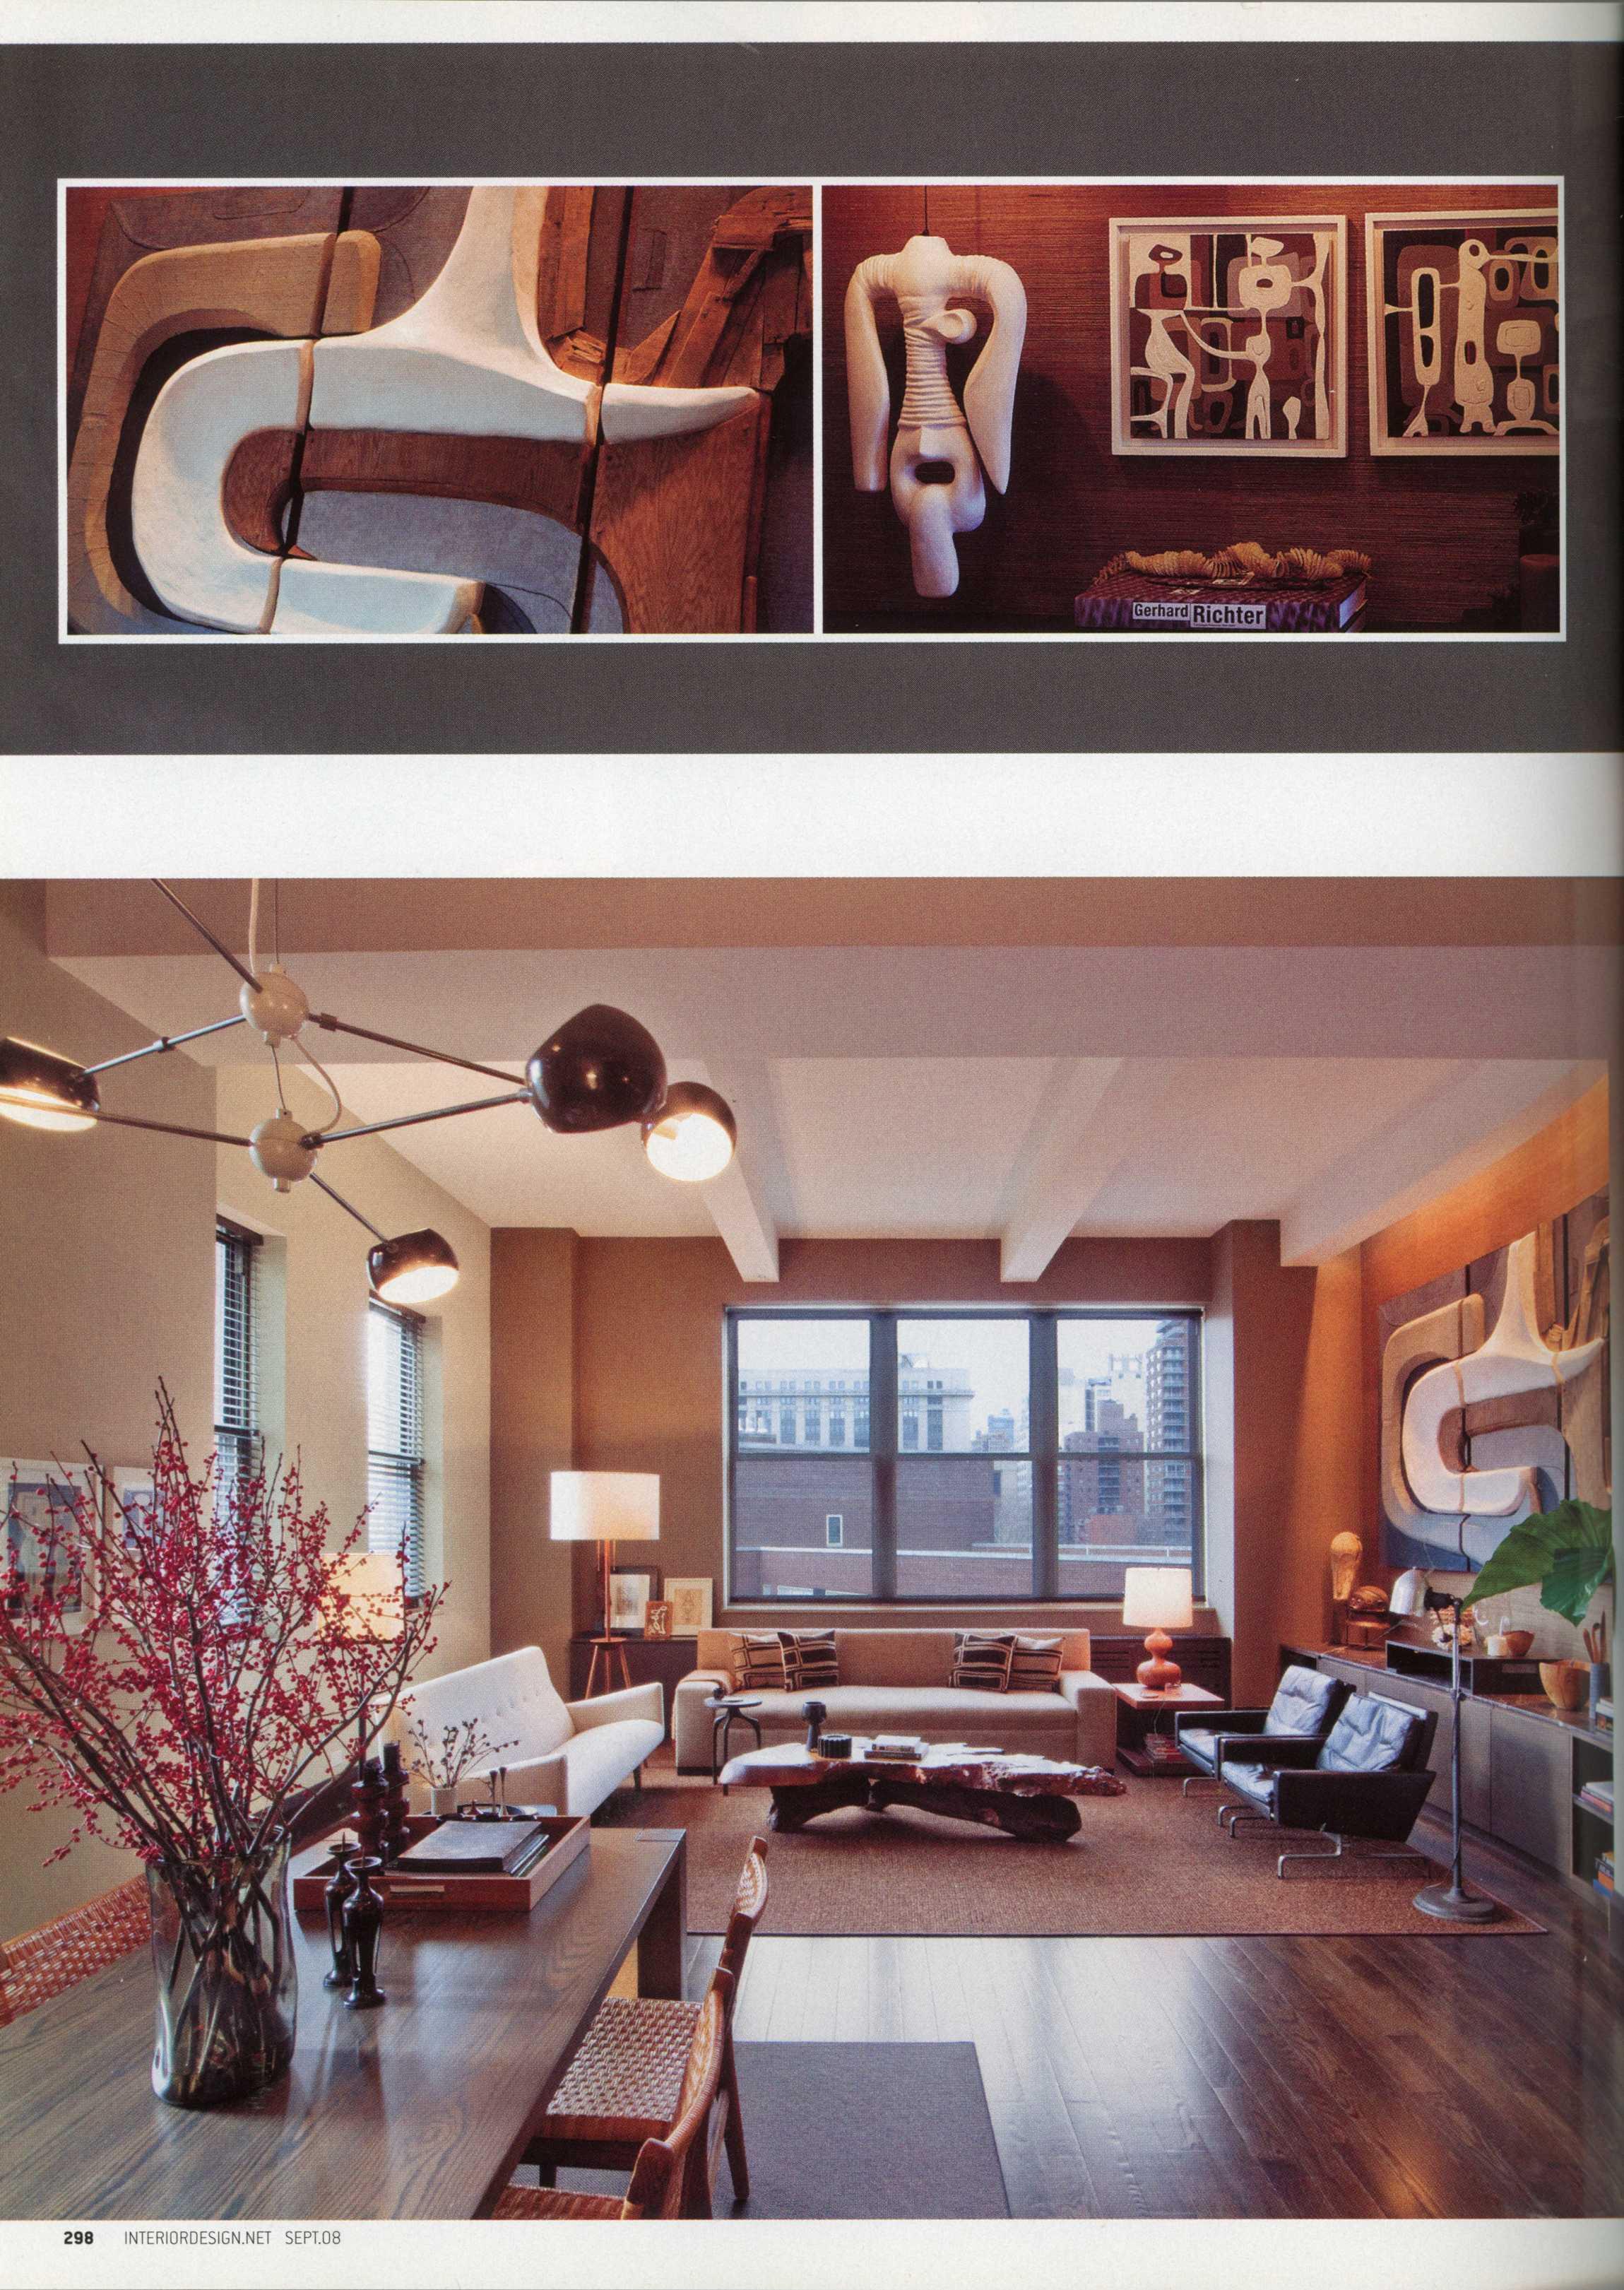 Interior Design_Sept 08_SS Apt_Full Article_Page_4.jpg